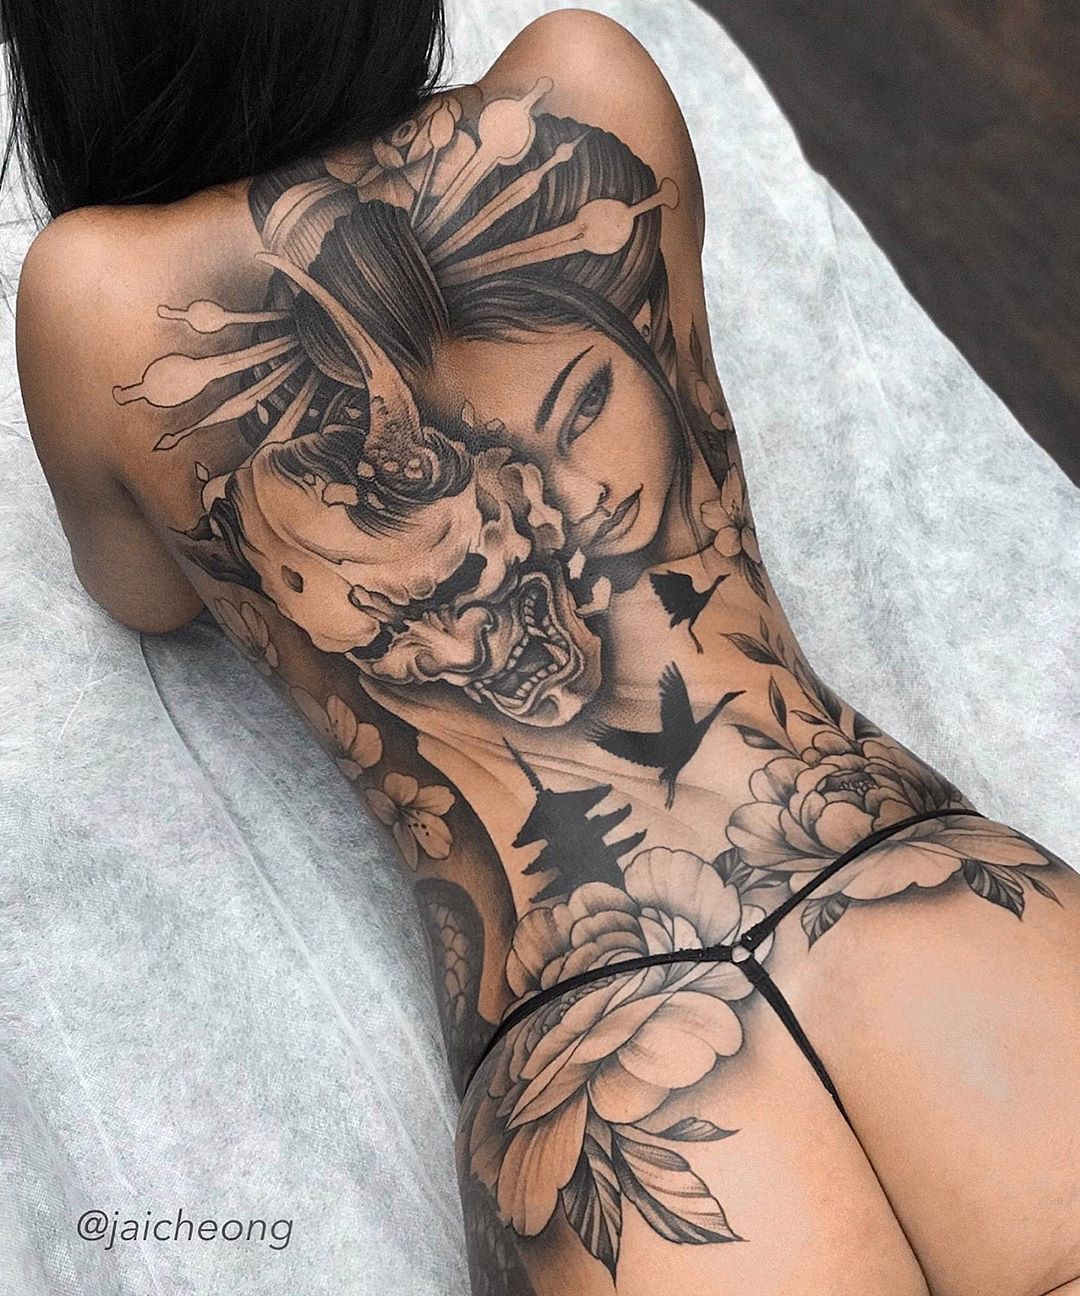 Japanese Women Tattoo with Hannya Mask